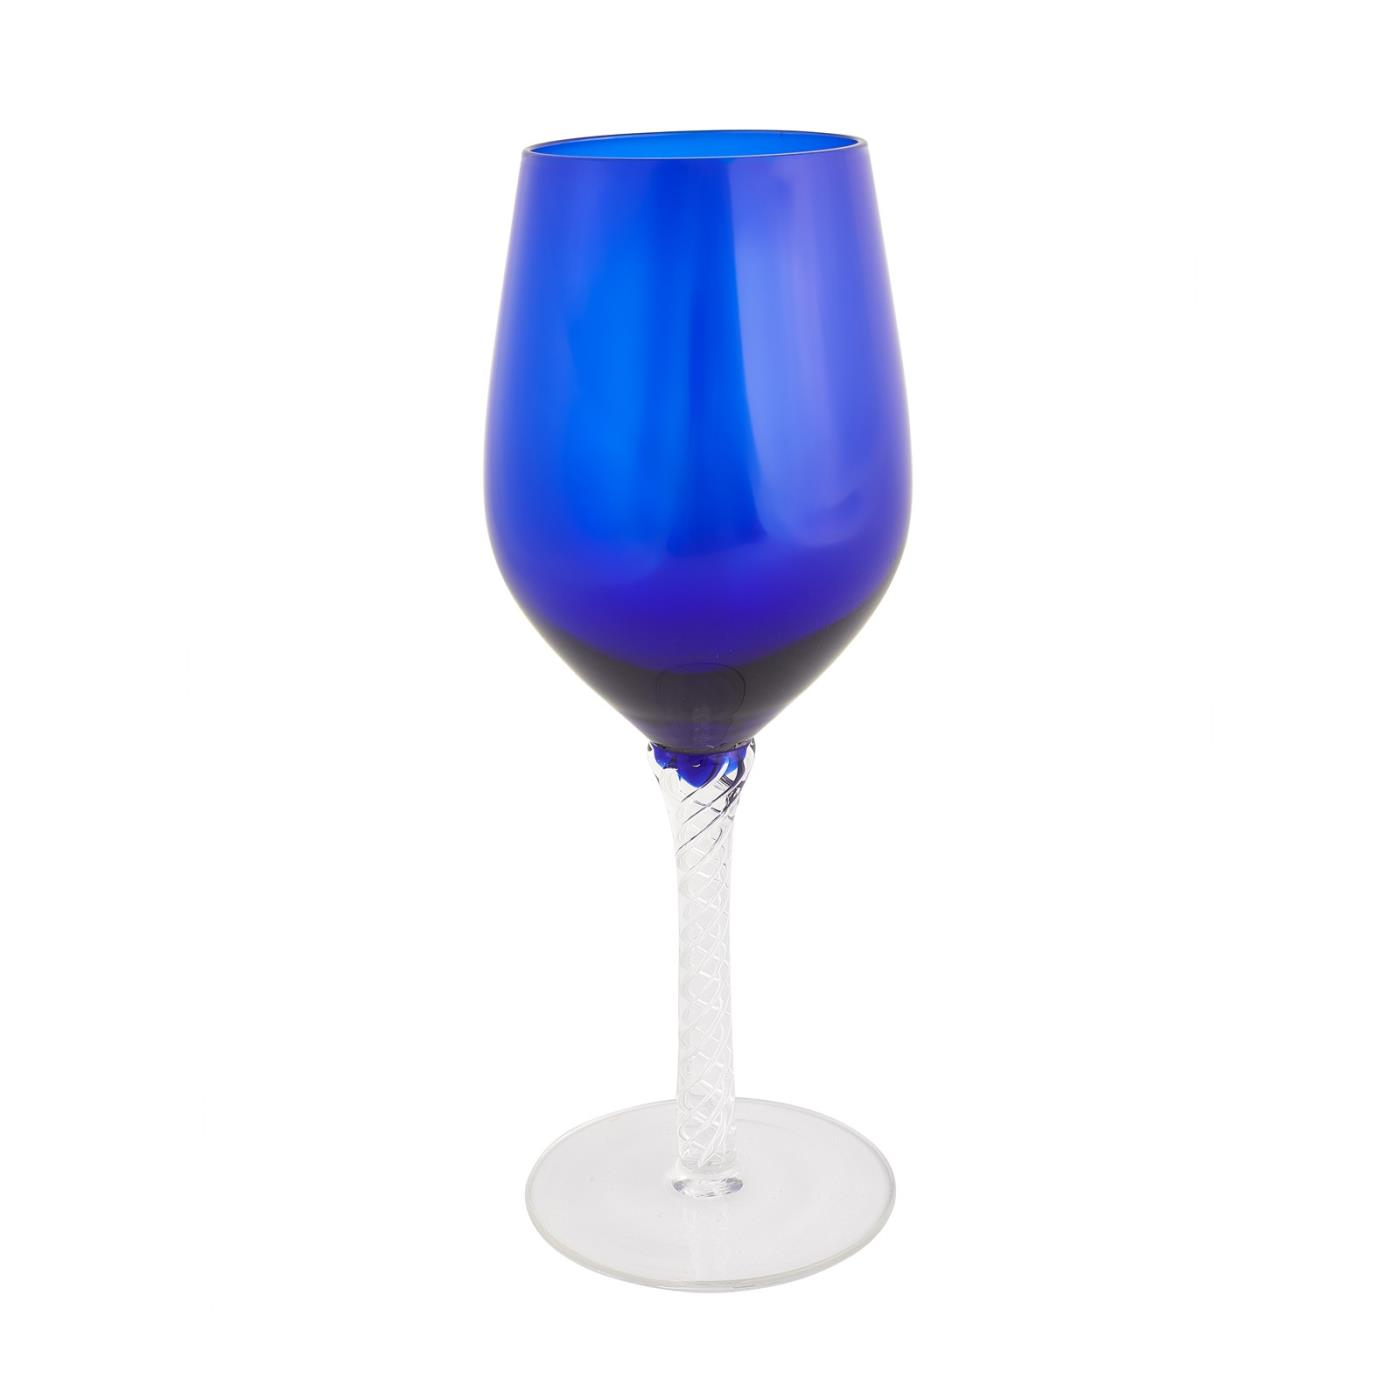 Blue Braided Wine Glass - Blue 14 oz